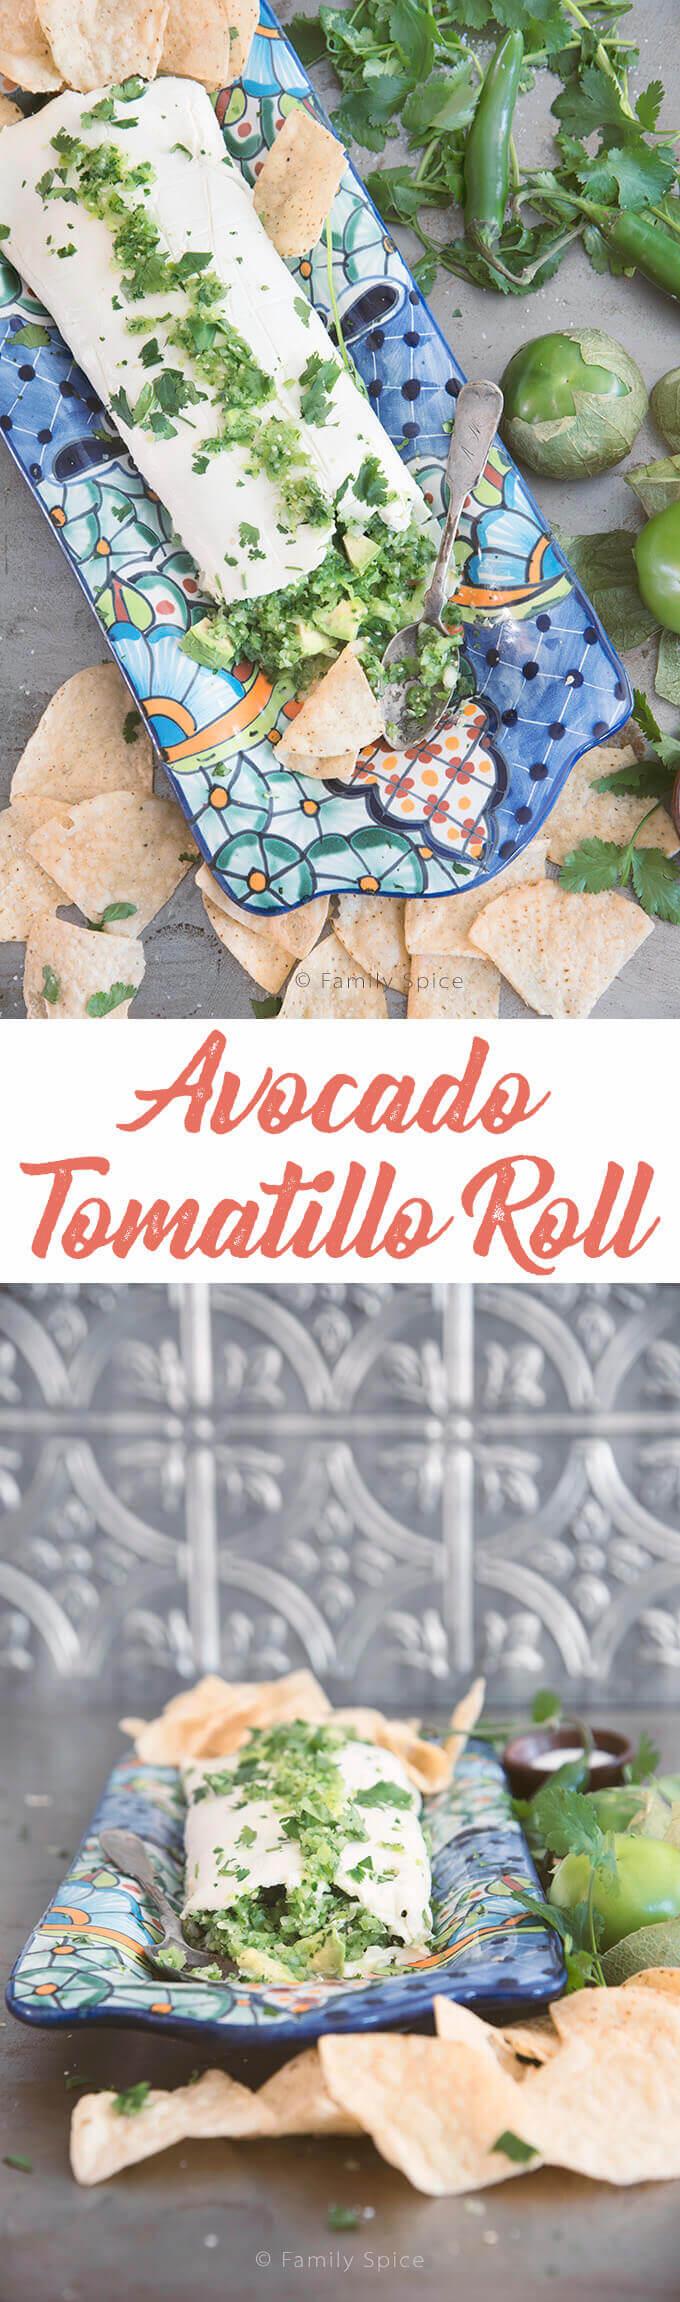 The Avocado Tomatillo Roll by FamilySpice.com